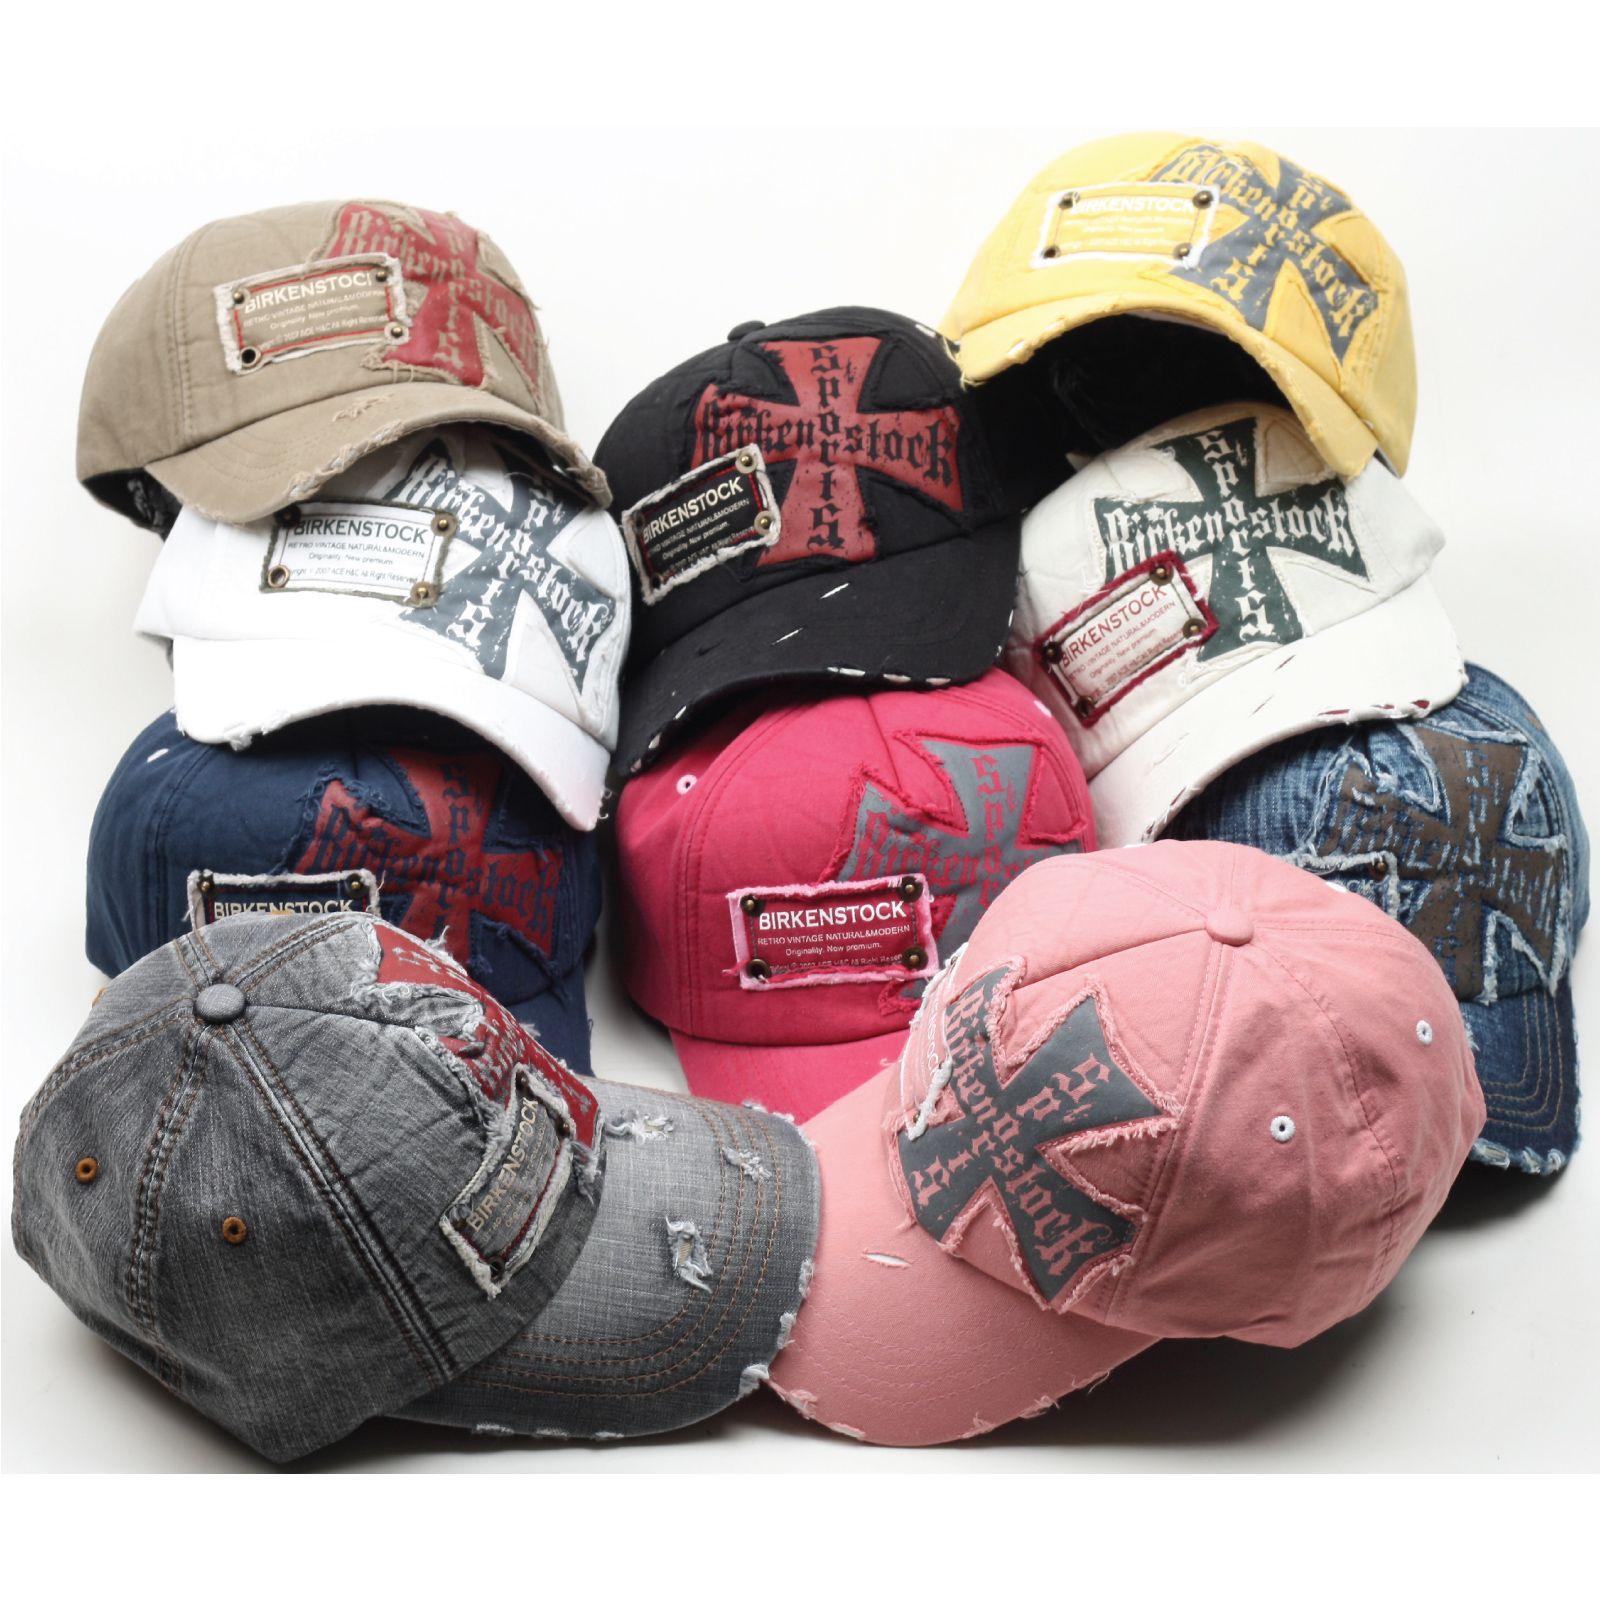 92b5fbf3b33 Raon B24 Best Unisex Vintage Look Hat Cross Emblem Baseball Design Ball Cap  Truckers